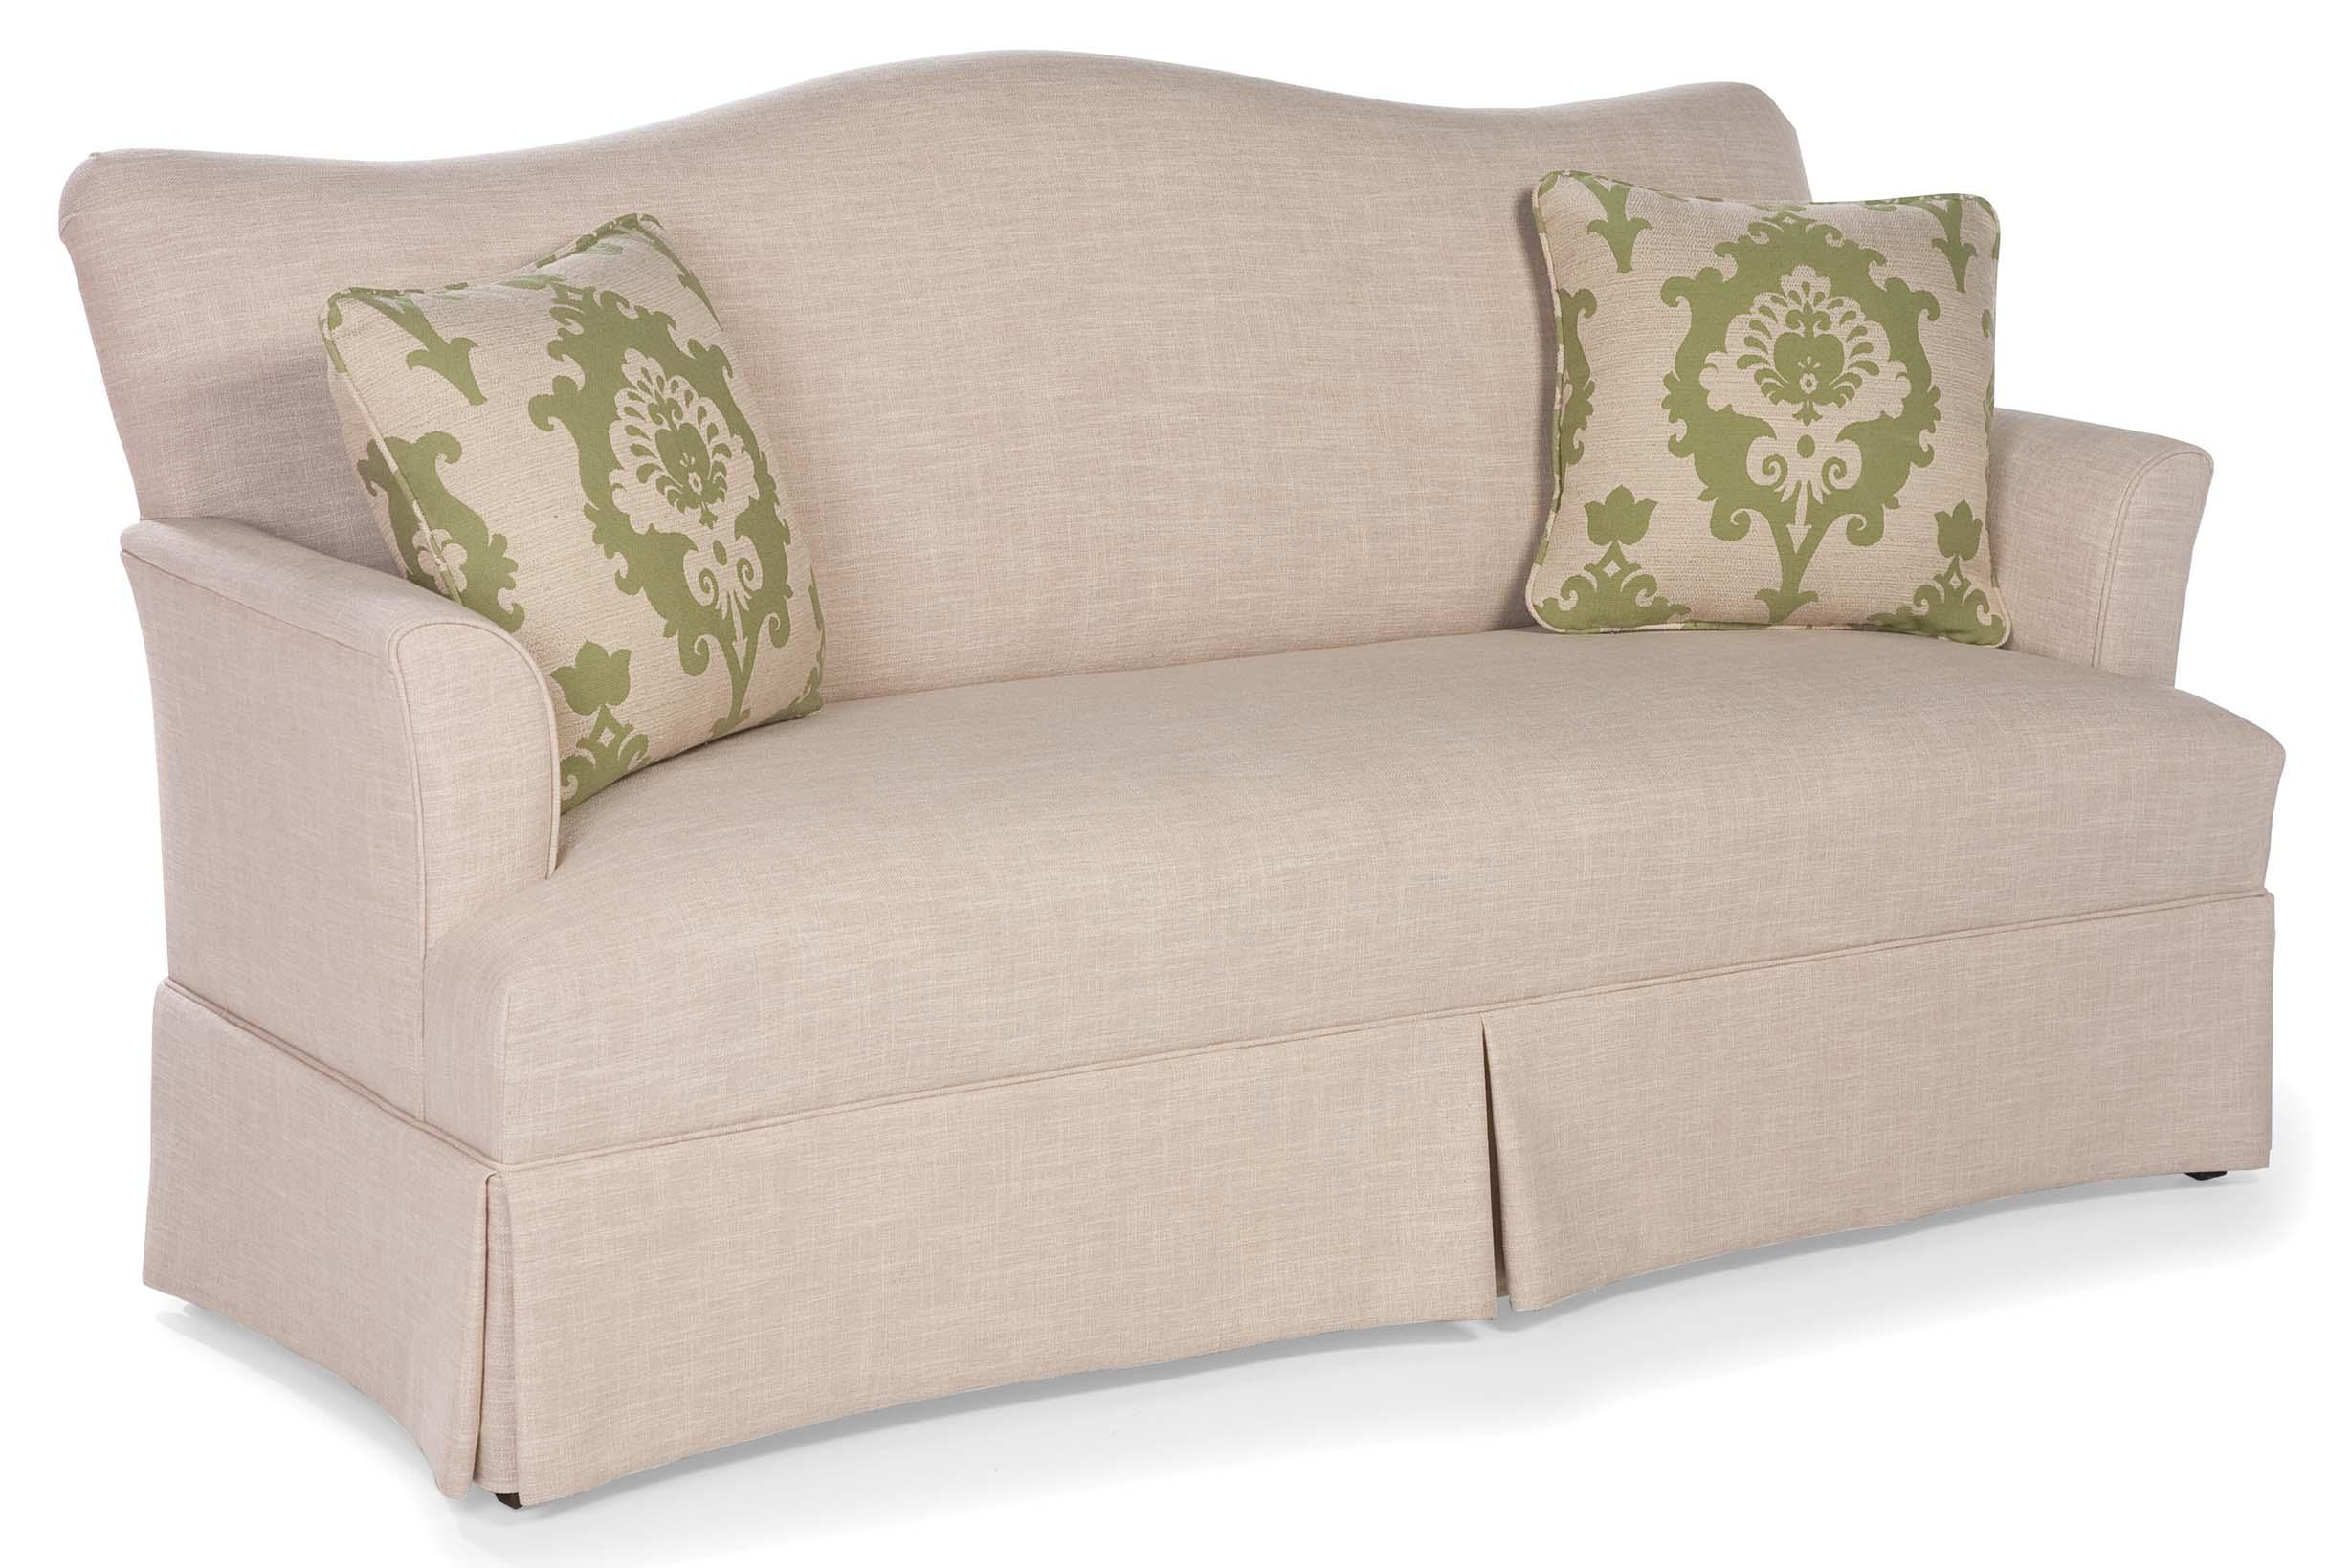 Fairfield Sofa Accents Skirted Camel Back Sofa Olinde 39 S Furniture Sofas